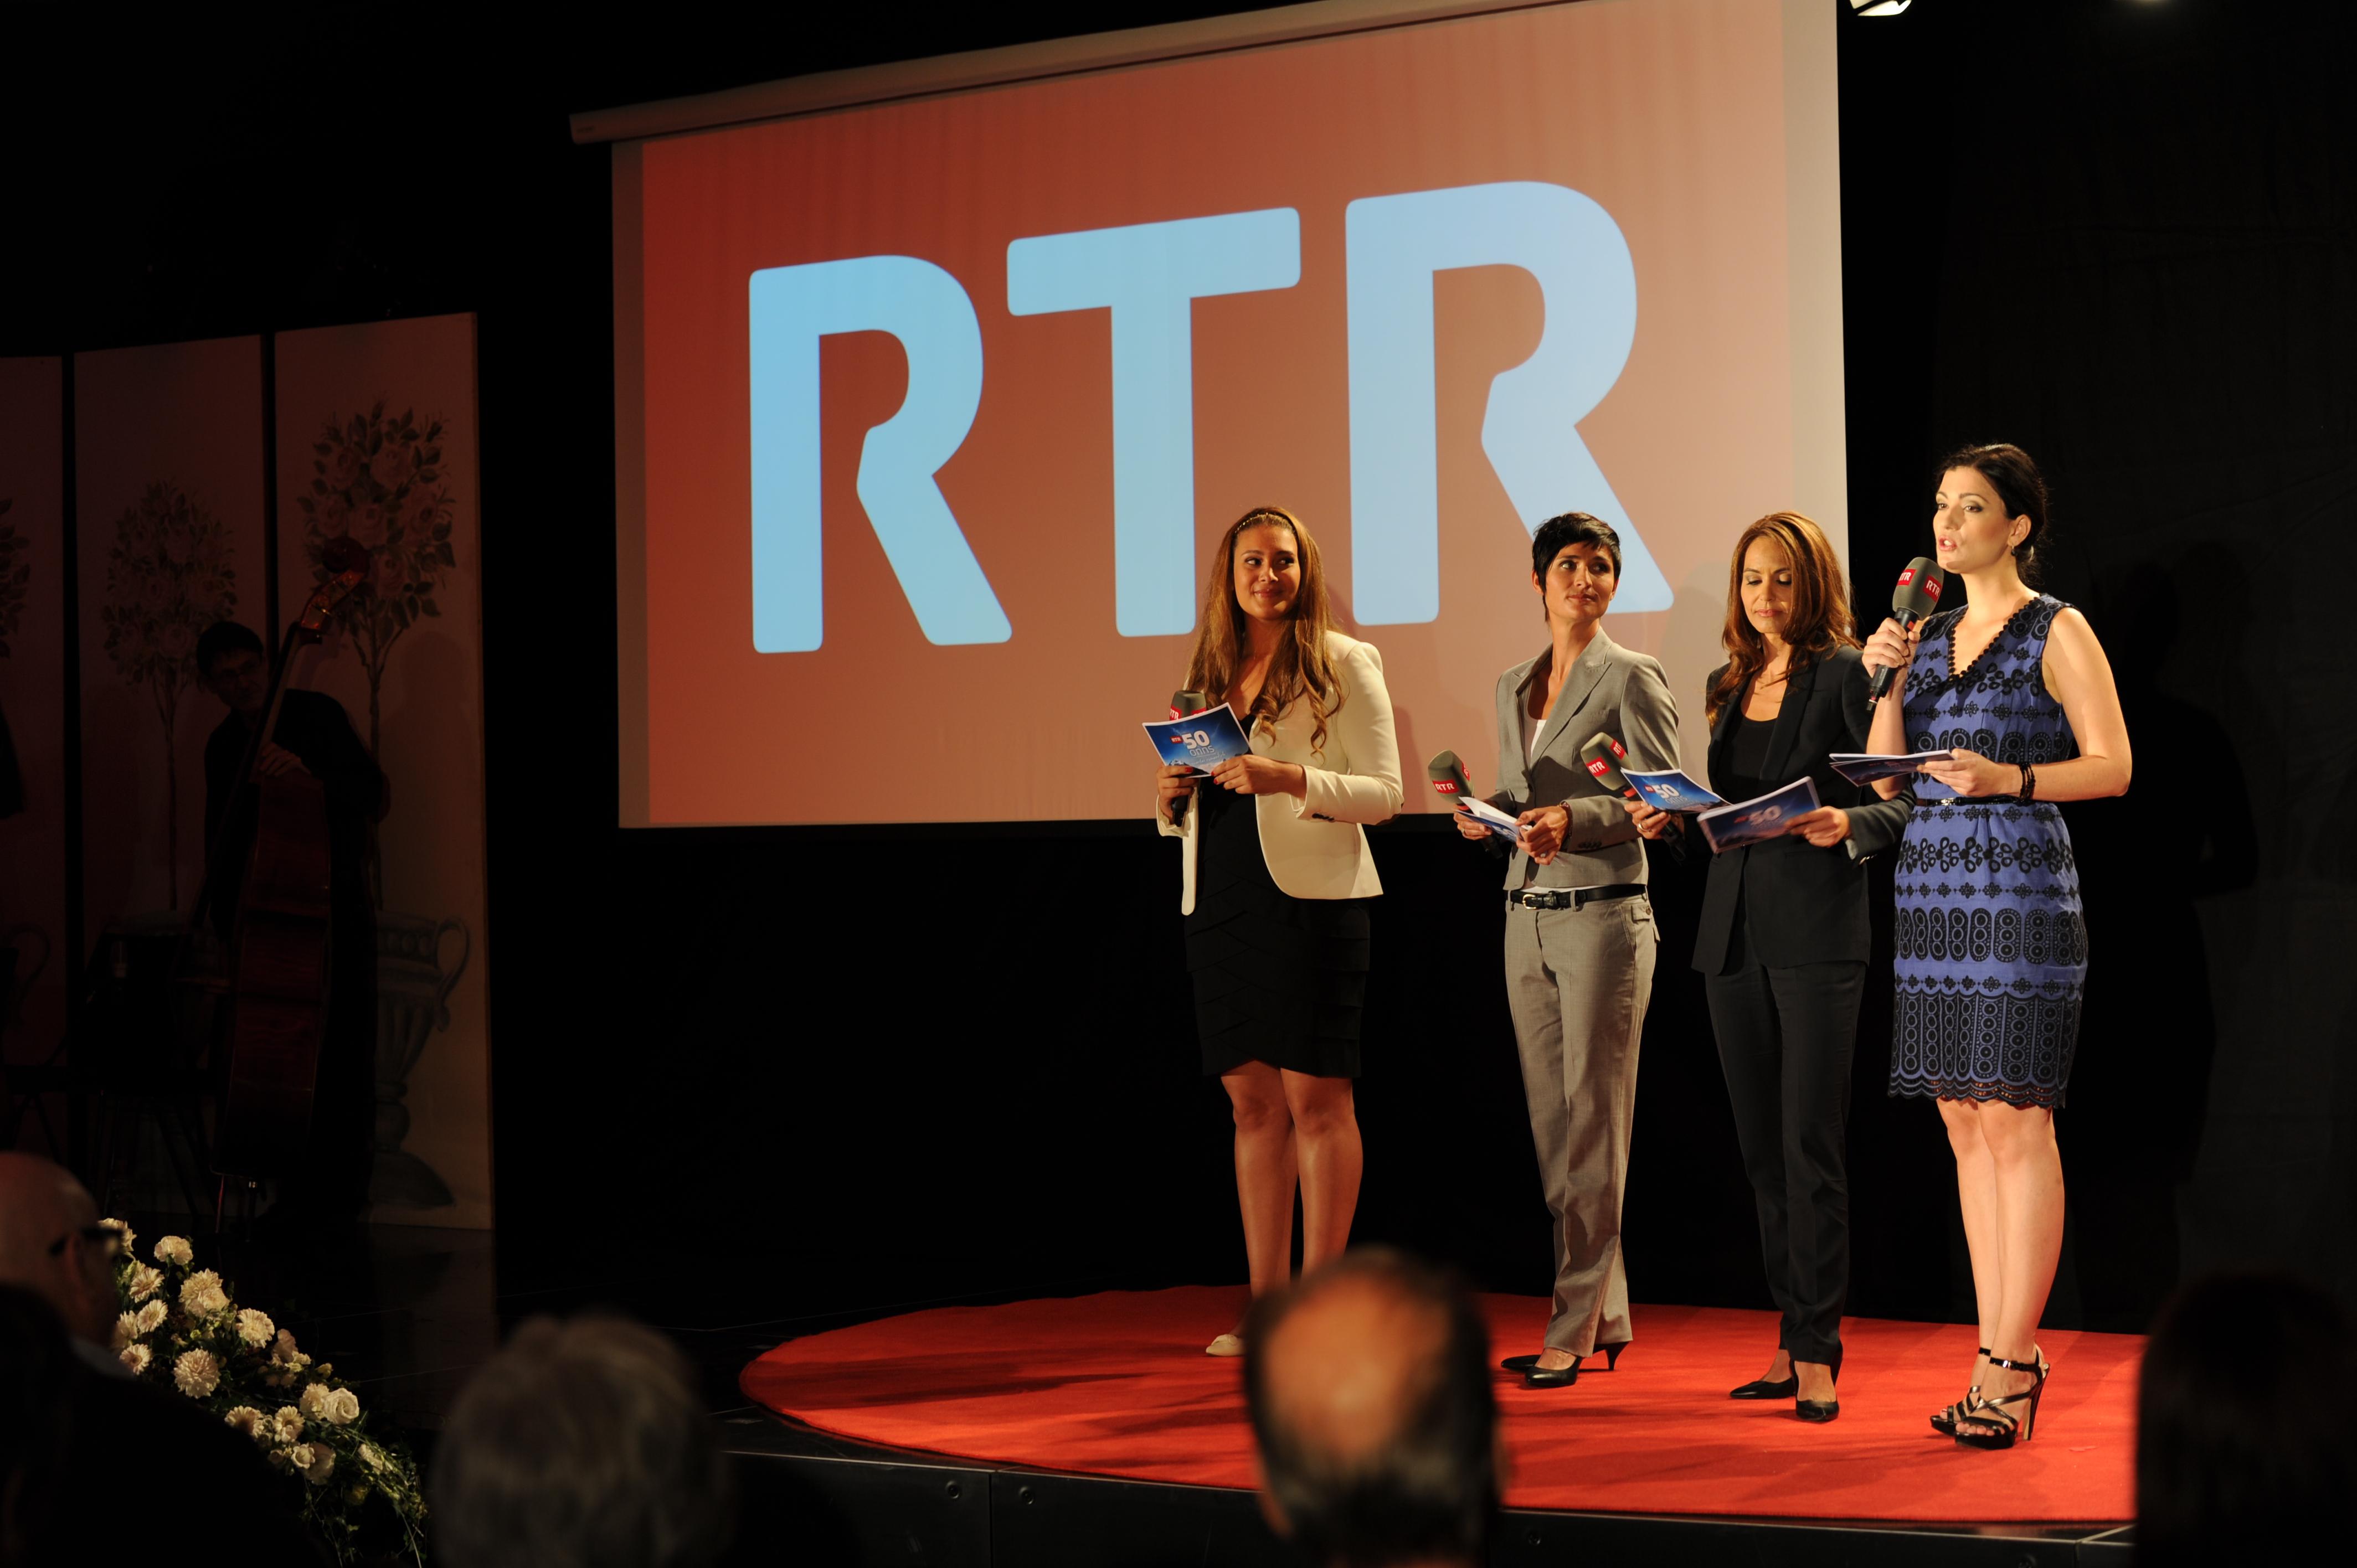 Las quatter moderaturas ch'han manà tras l'act festiv: Elin Batista, Ulrica Morell, Isabella Wieland e Maria Victoria Haas.